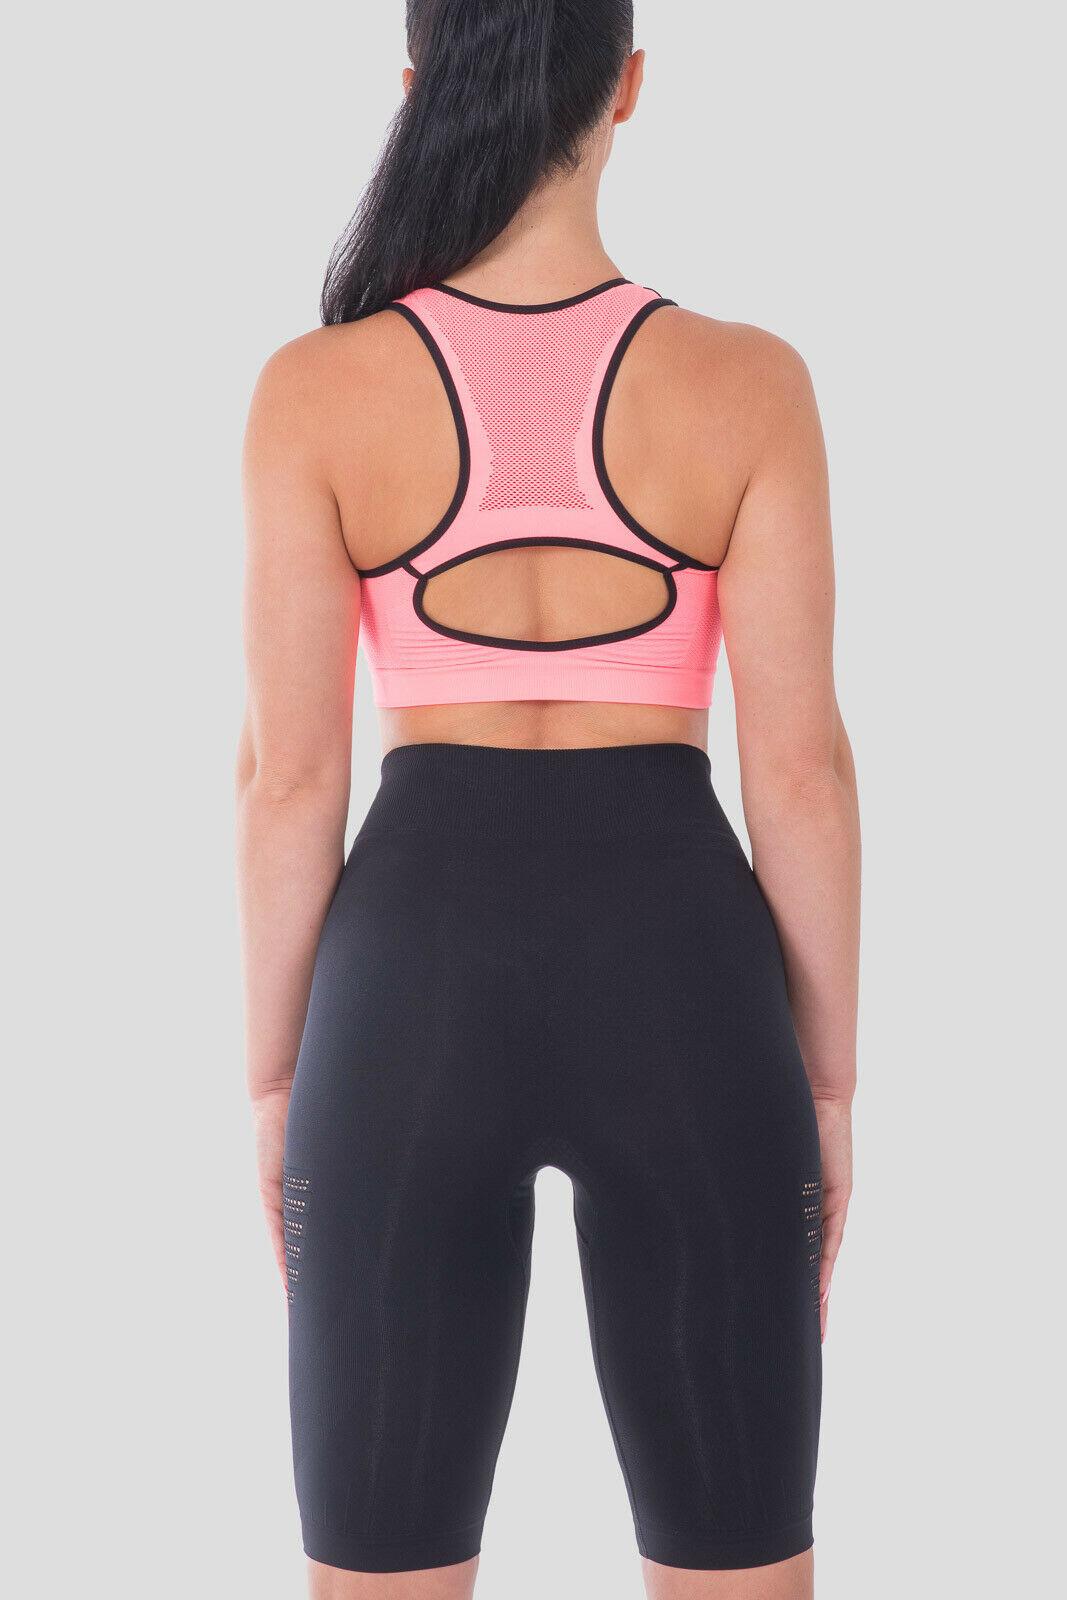 Bellissima-Women-039-s-Sport-Bra-Running-Yoga-Workout-Fitness-Racerback-Seamless thumbnail 52